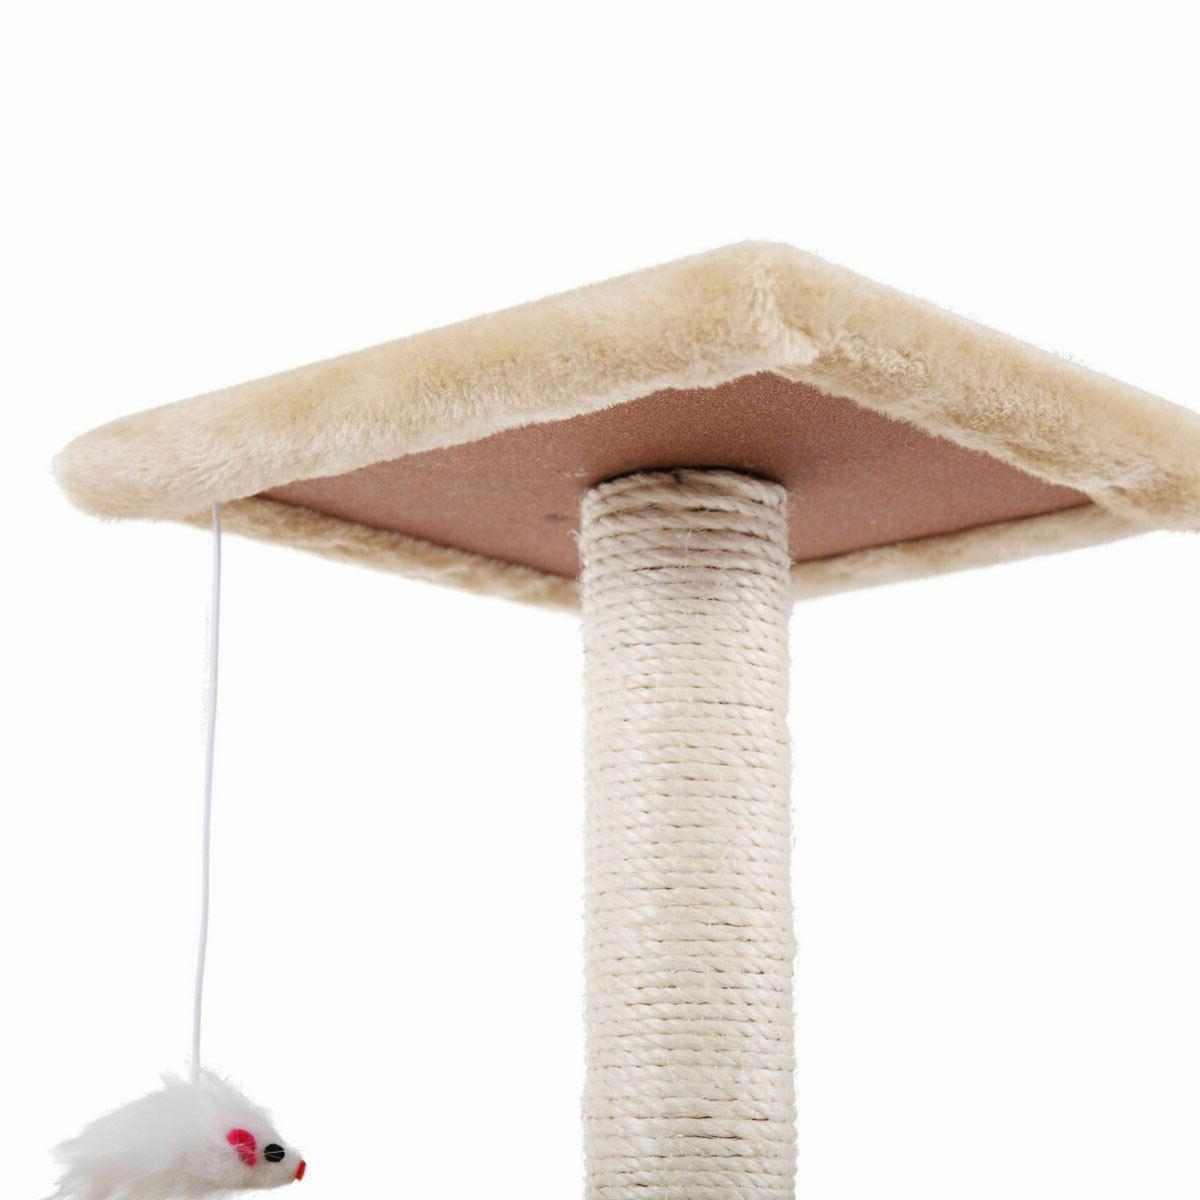 Deluxe Condo Furniture Kitten Pet with